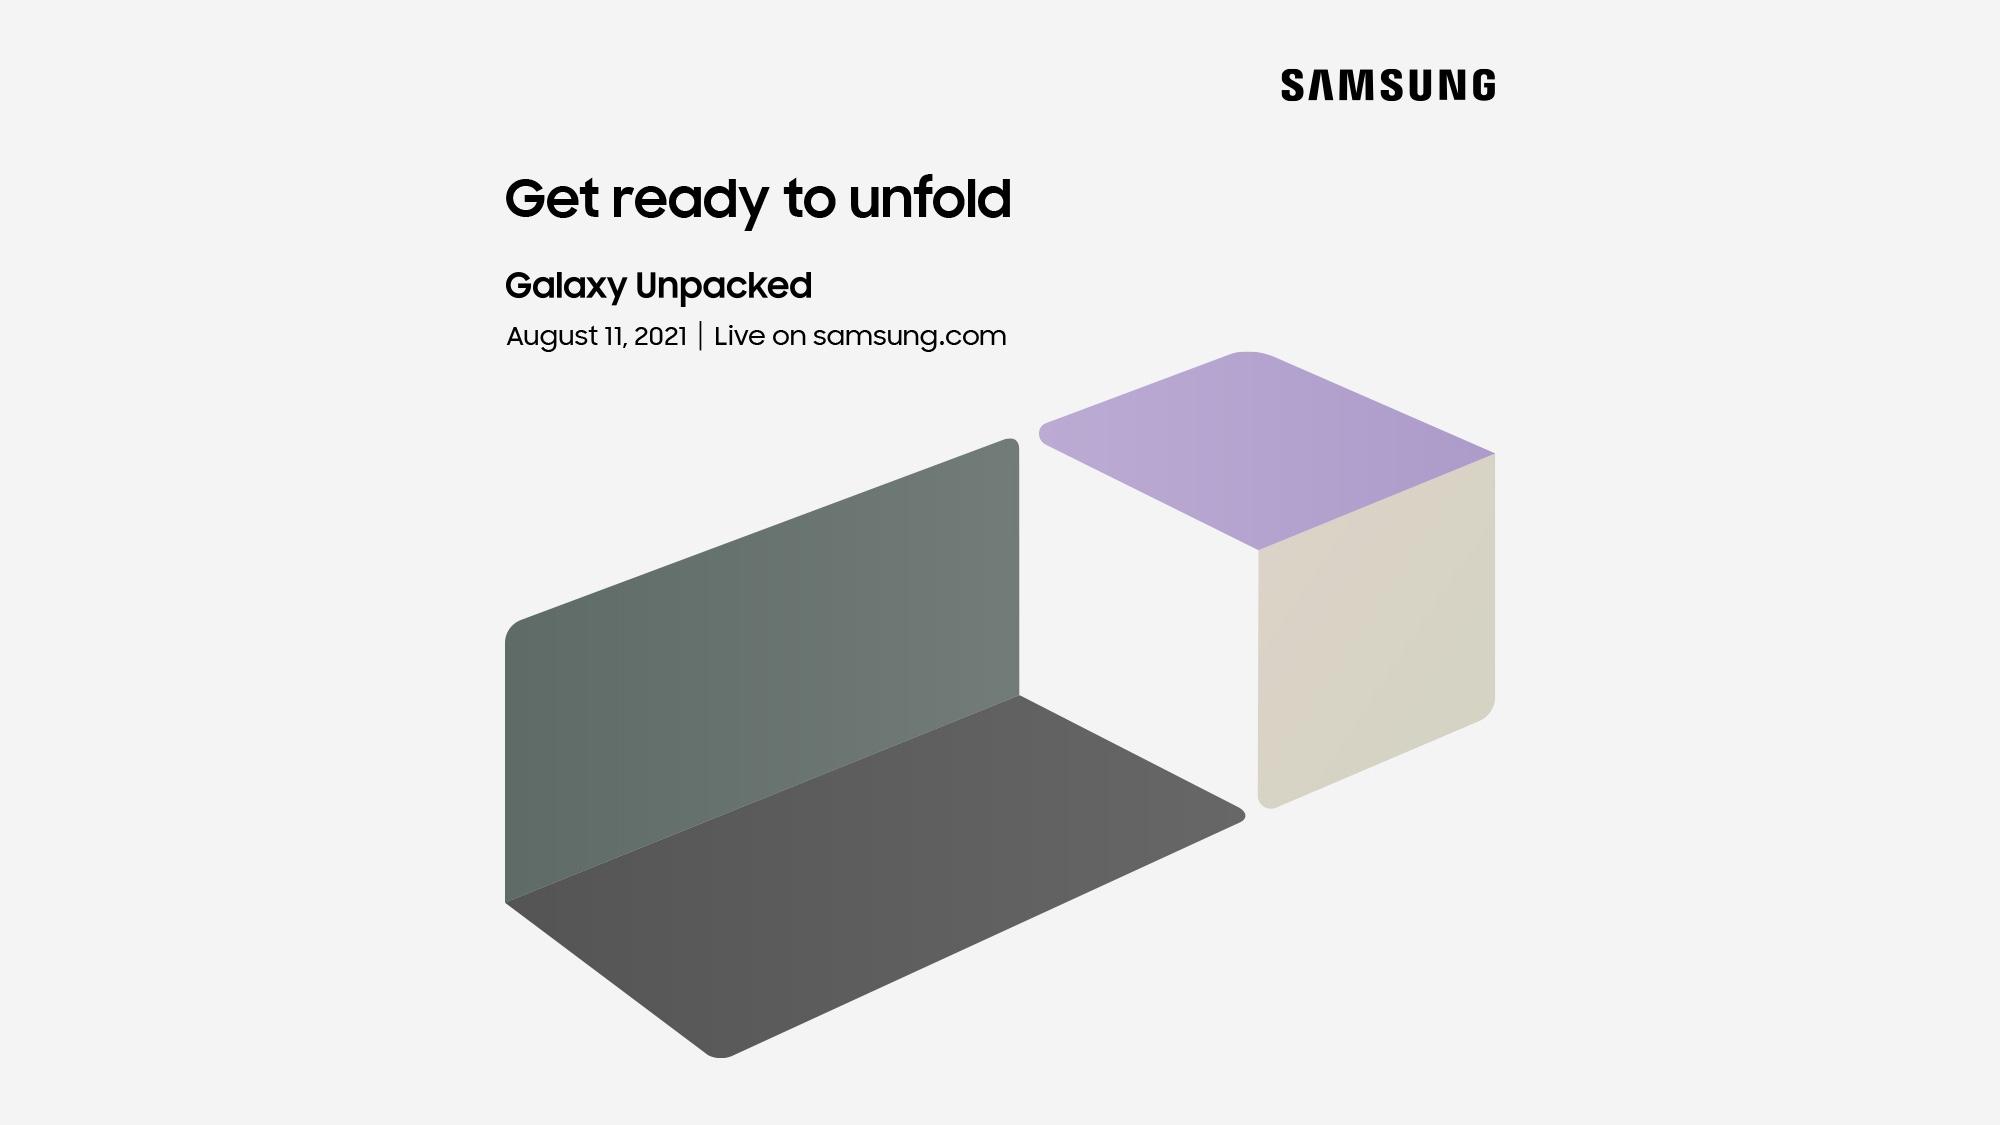 Samsung Unpacked August 11 event